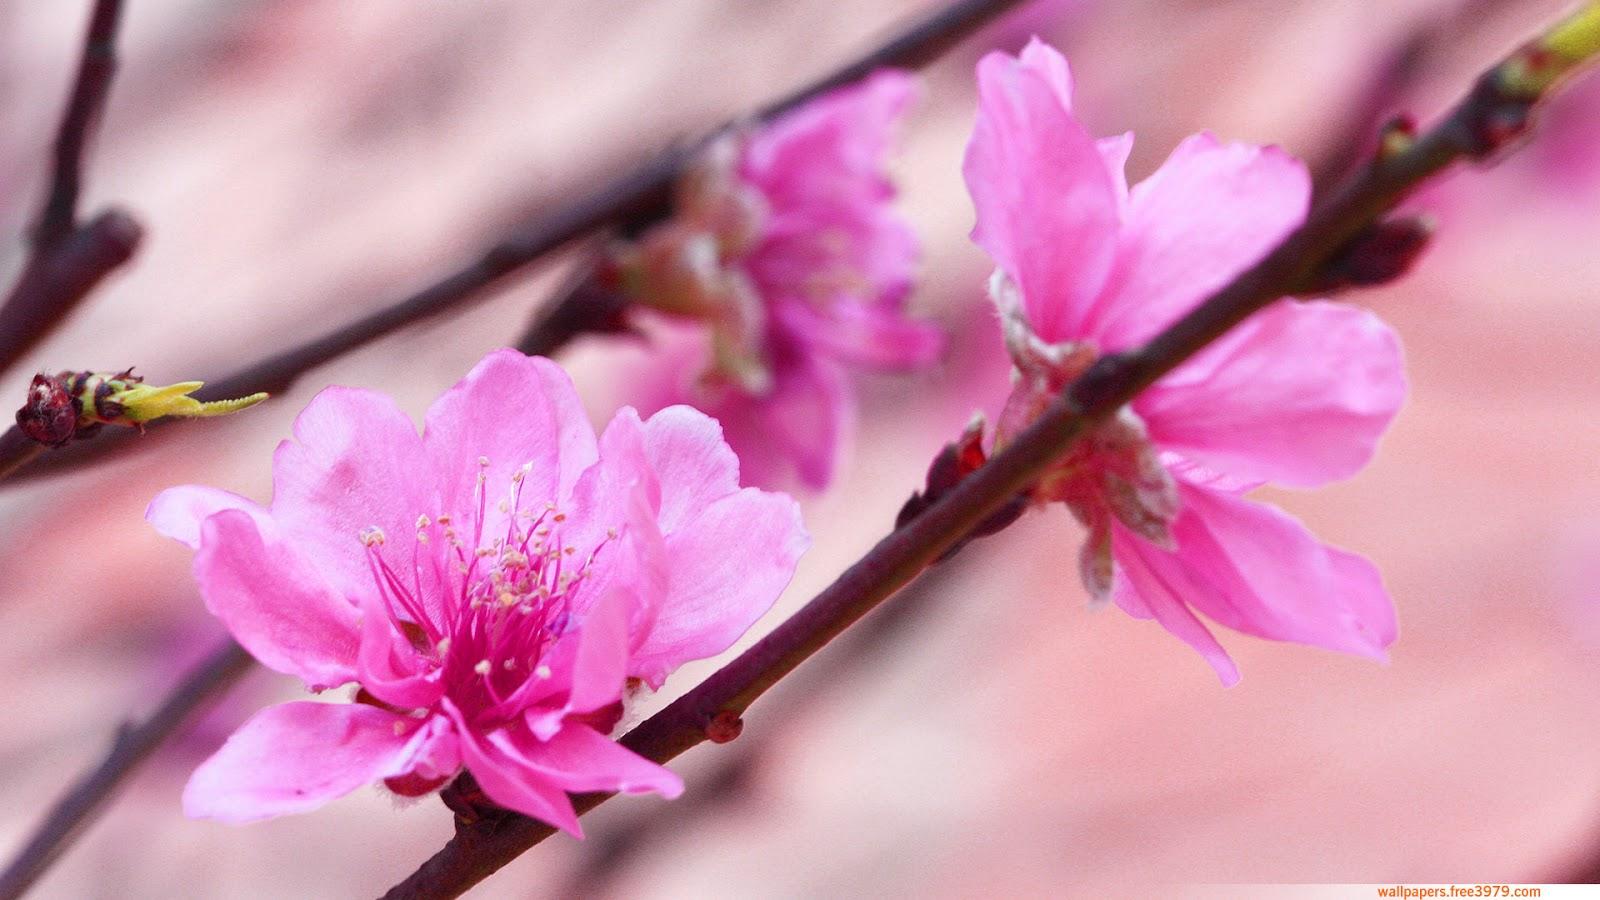 Asian teens cherry blossom virgins